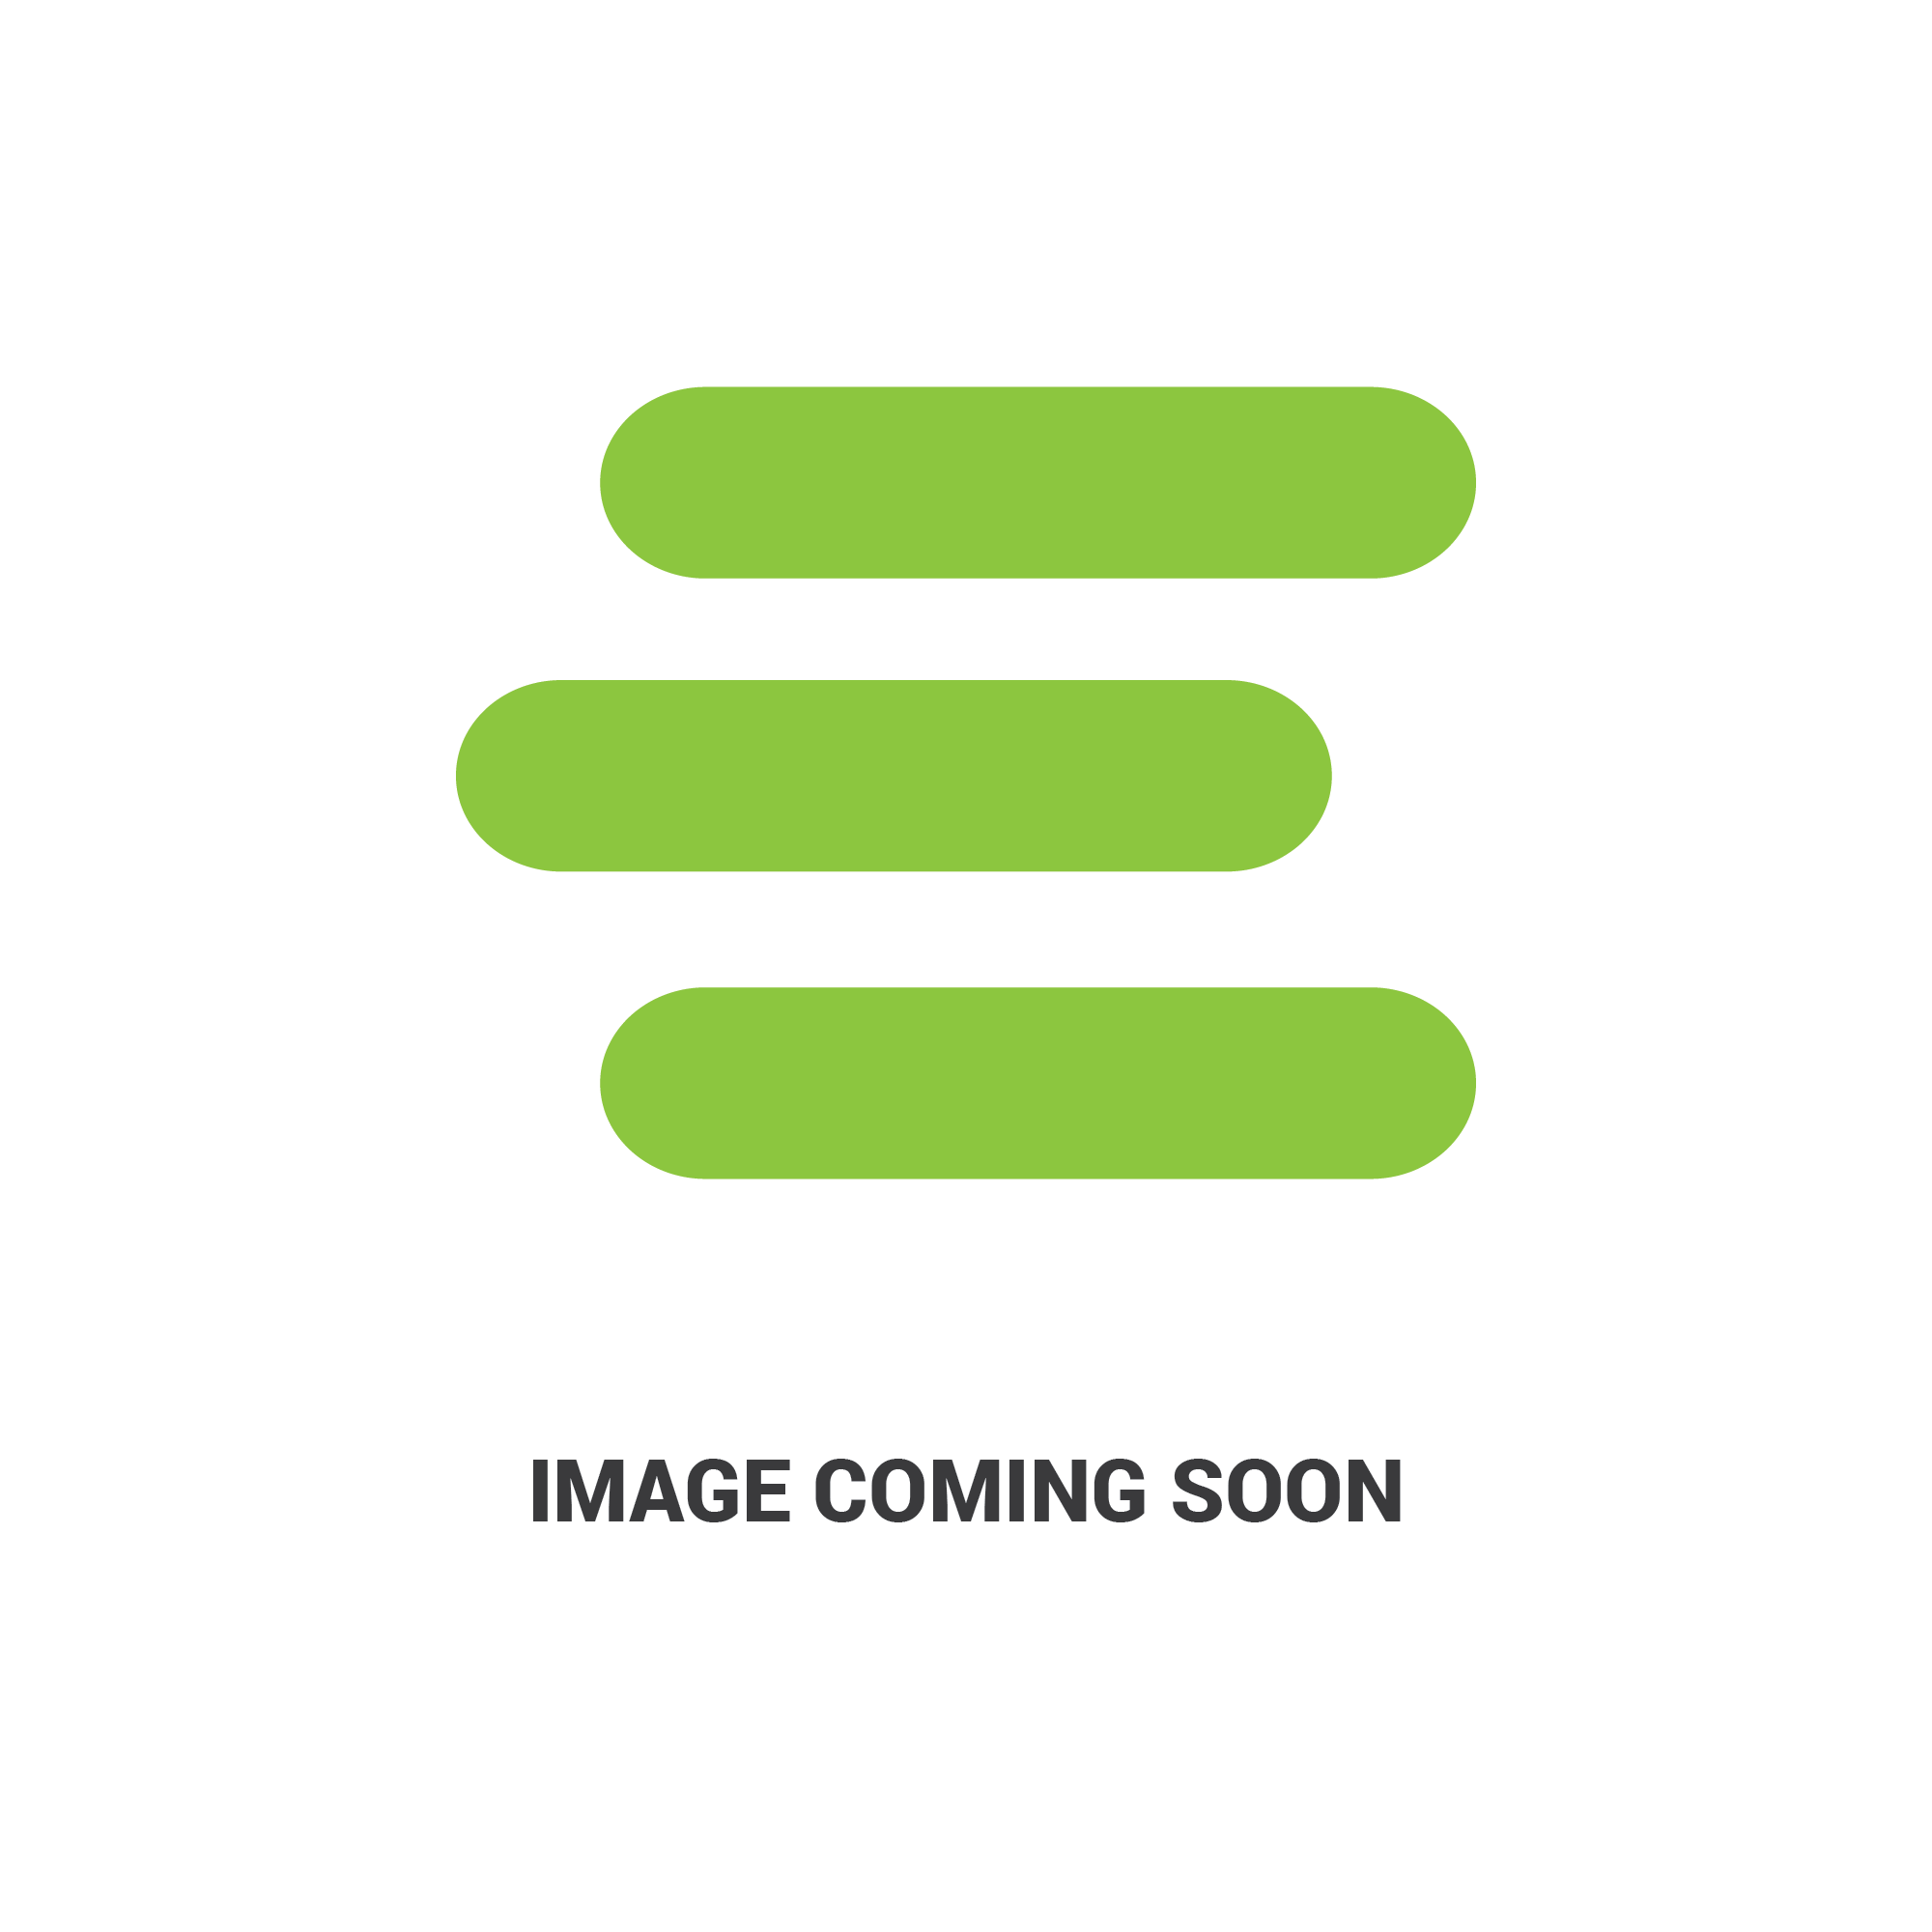 E-141185edit 1.jpg